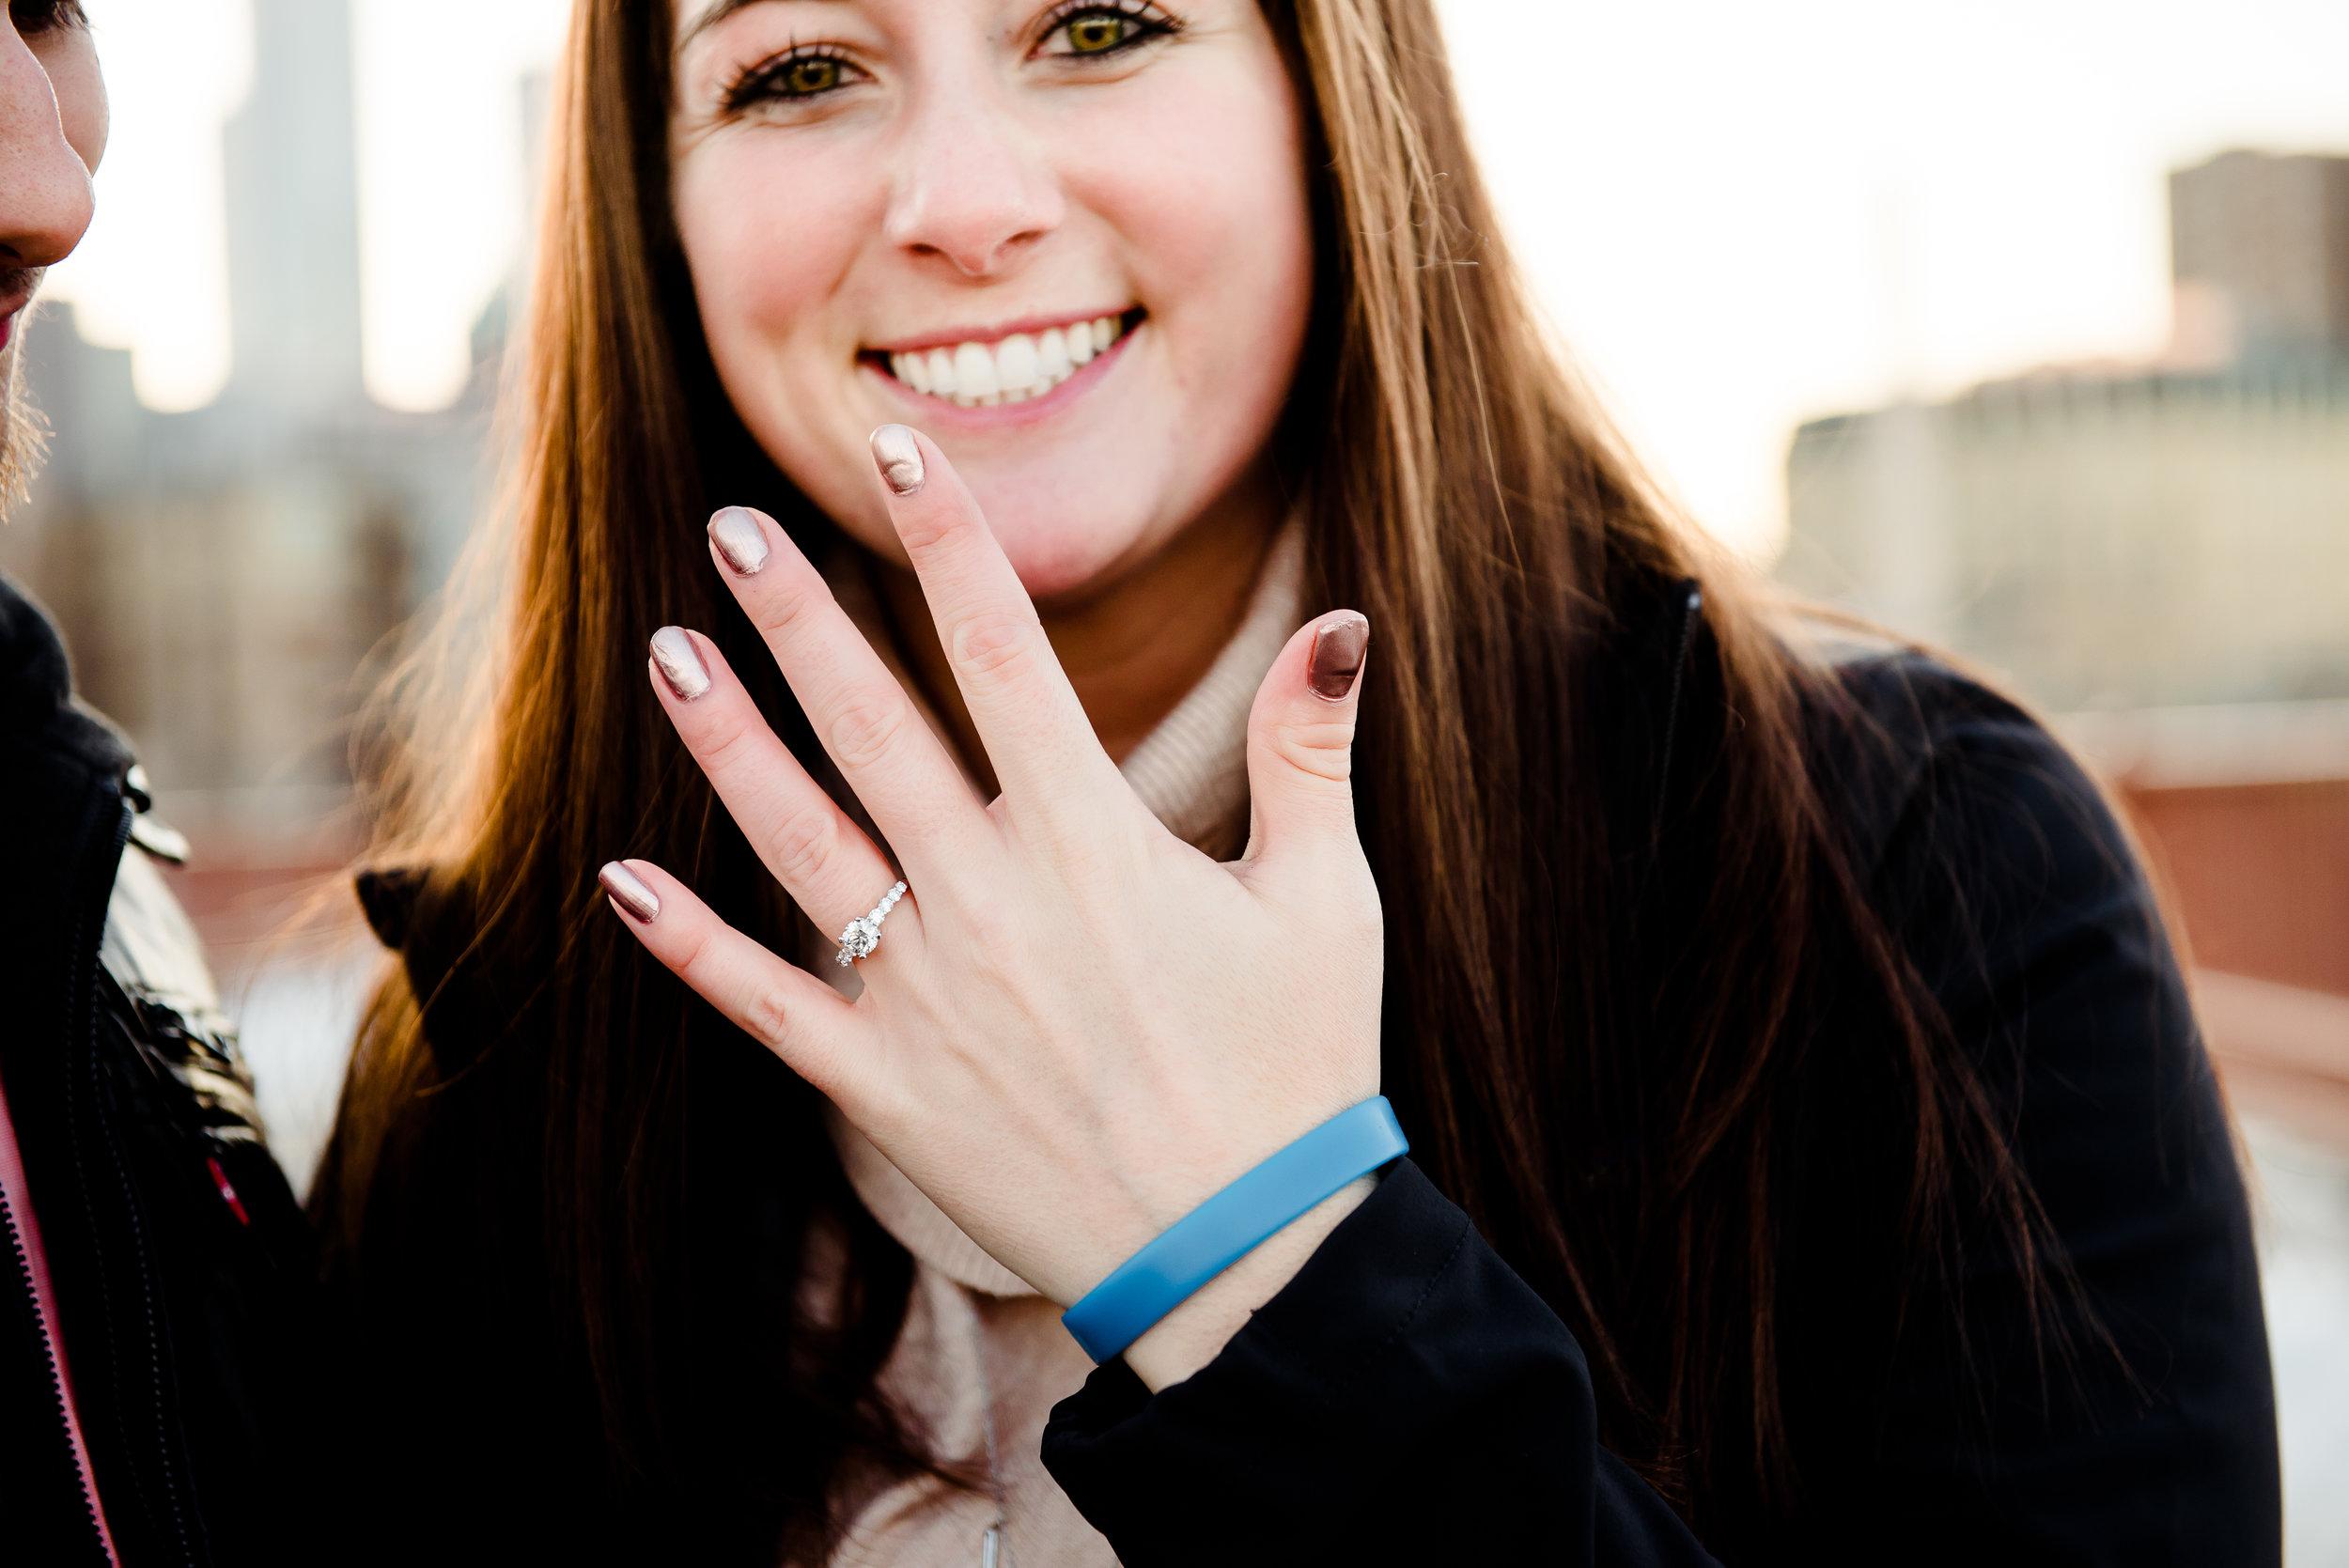 Stone Arch Bridge Surprise Proposal at Sunset in Winter - MN Engagement Proposal Photgrapher